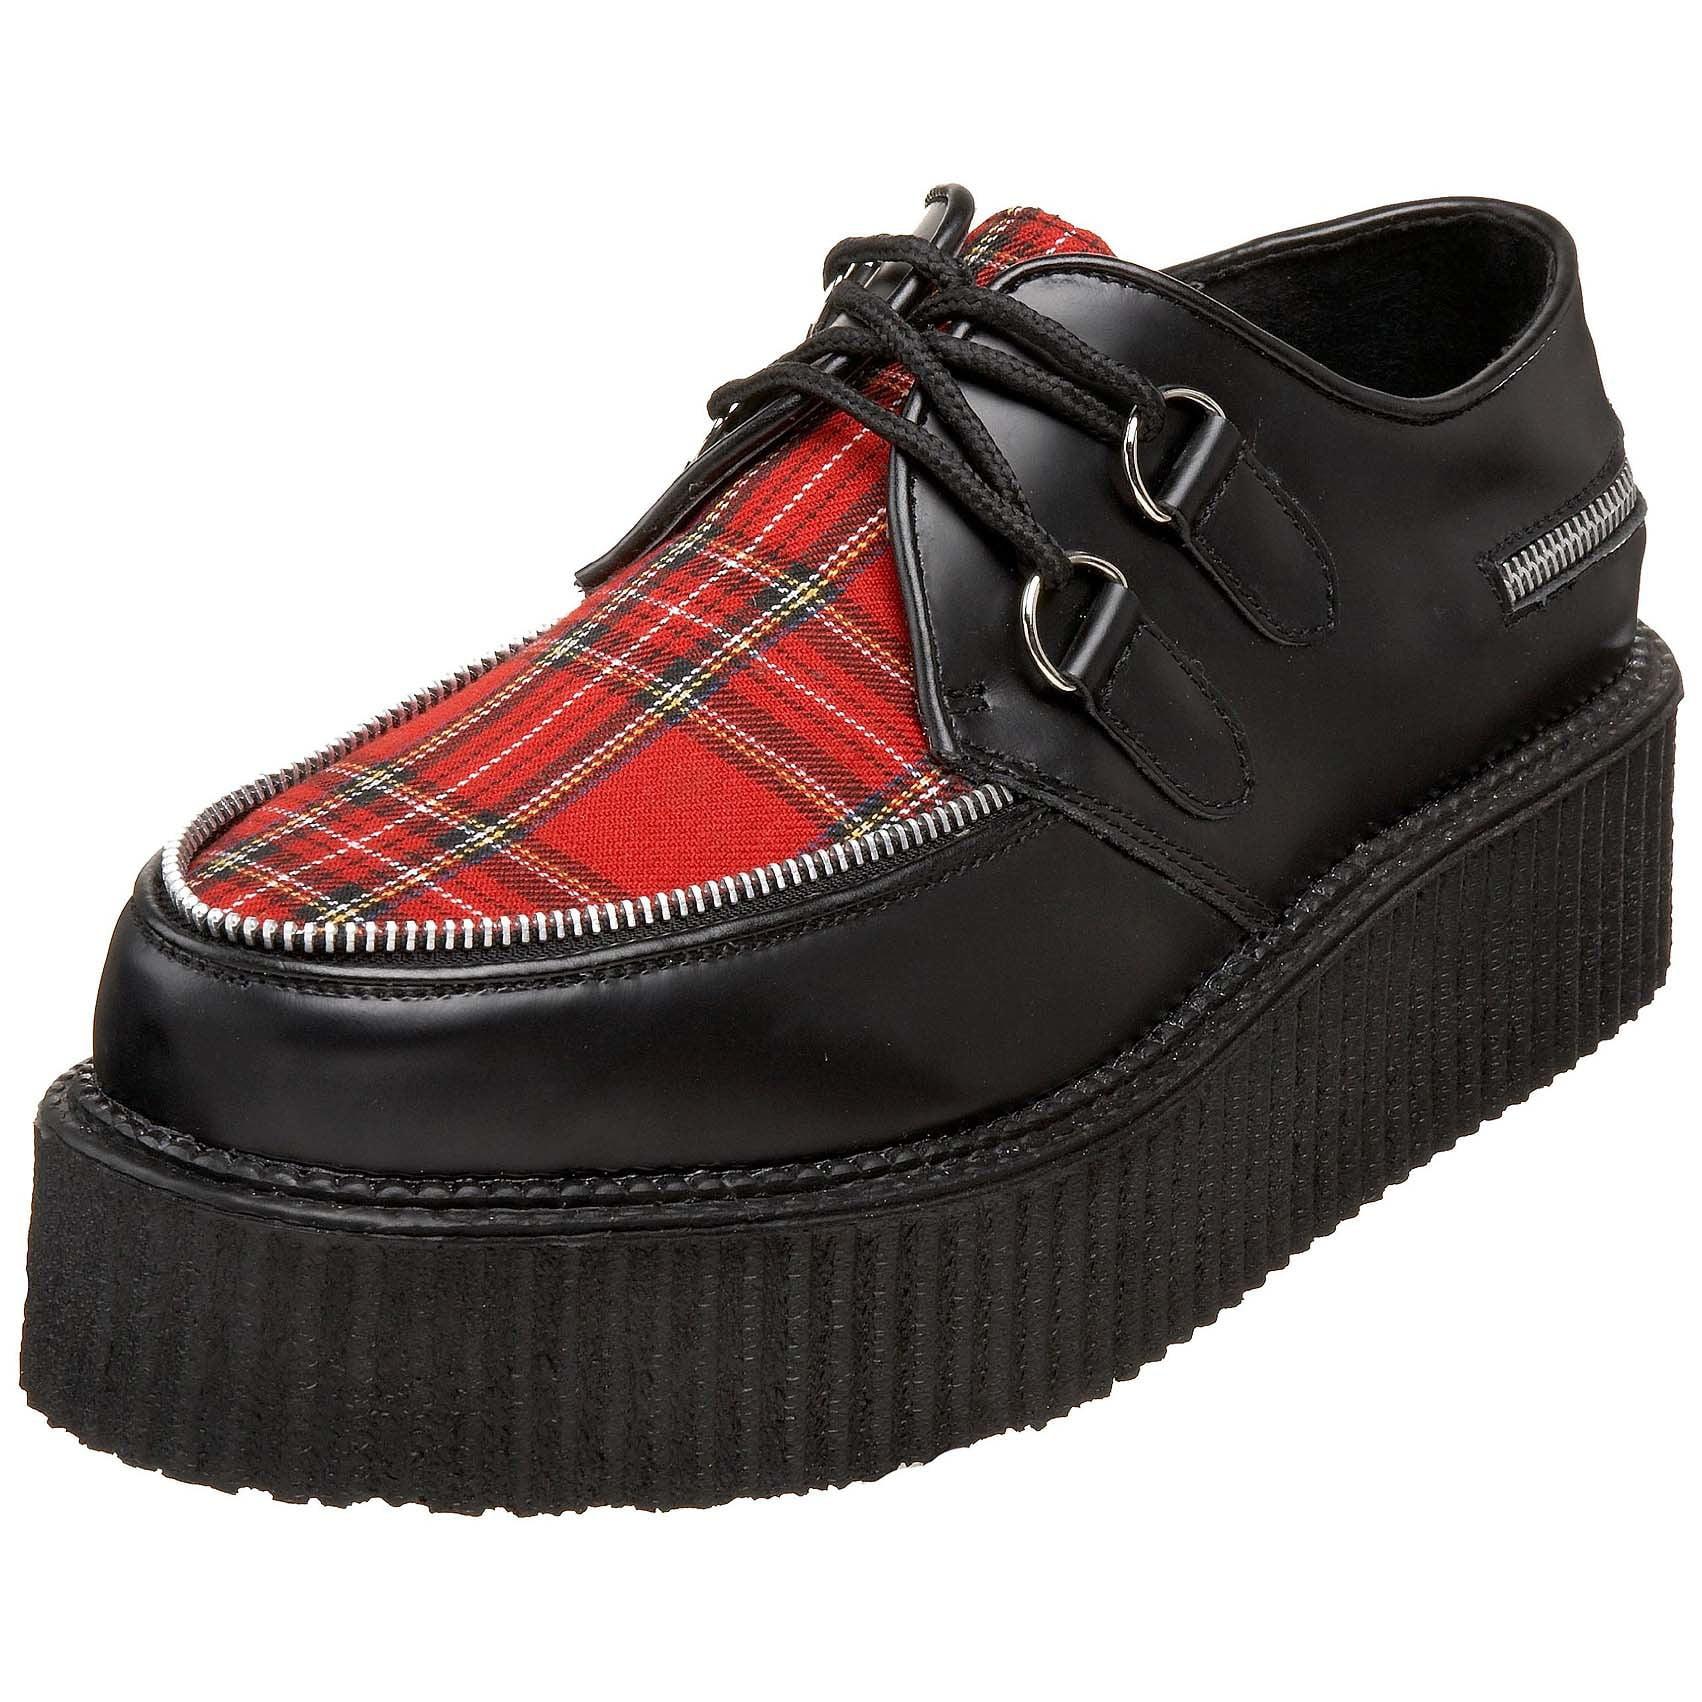 mens creeper shoes 2 inch platform retro black shoes